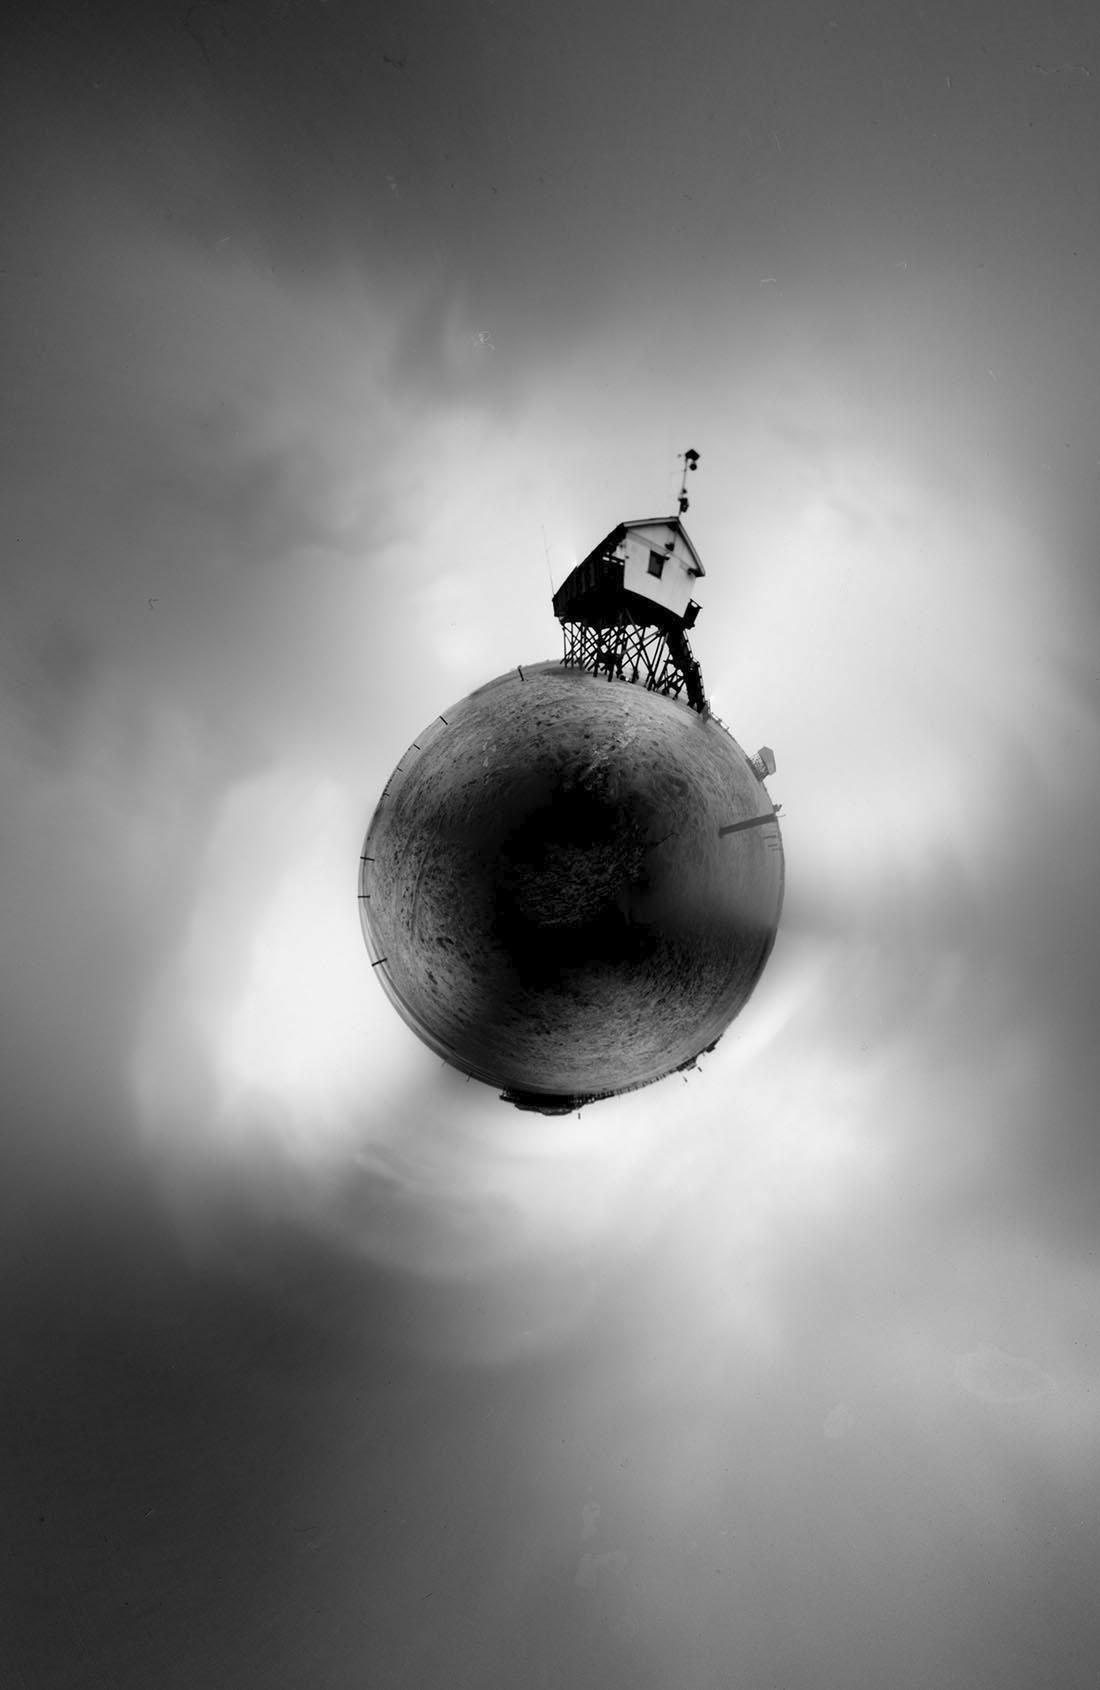 Sankt Peter-Ording Kleiner Planet , Lochkamera Fotografie